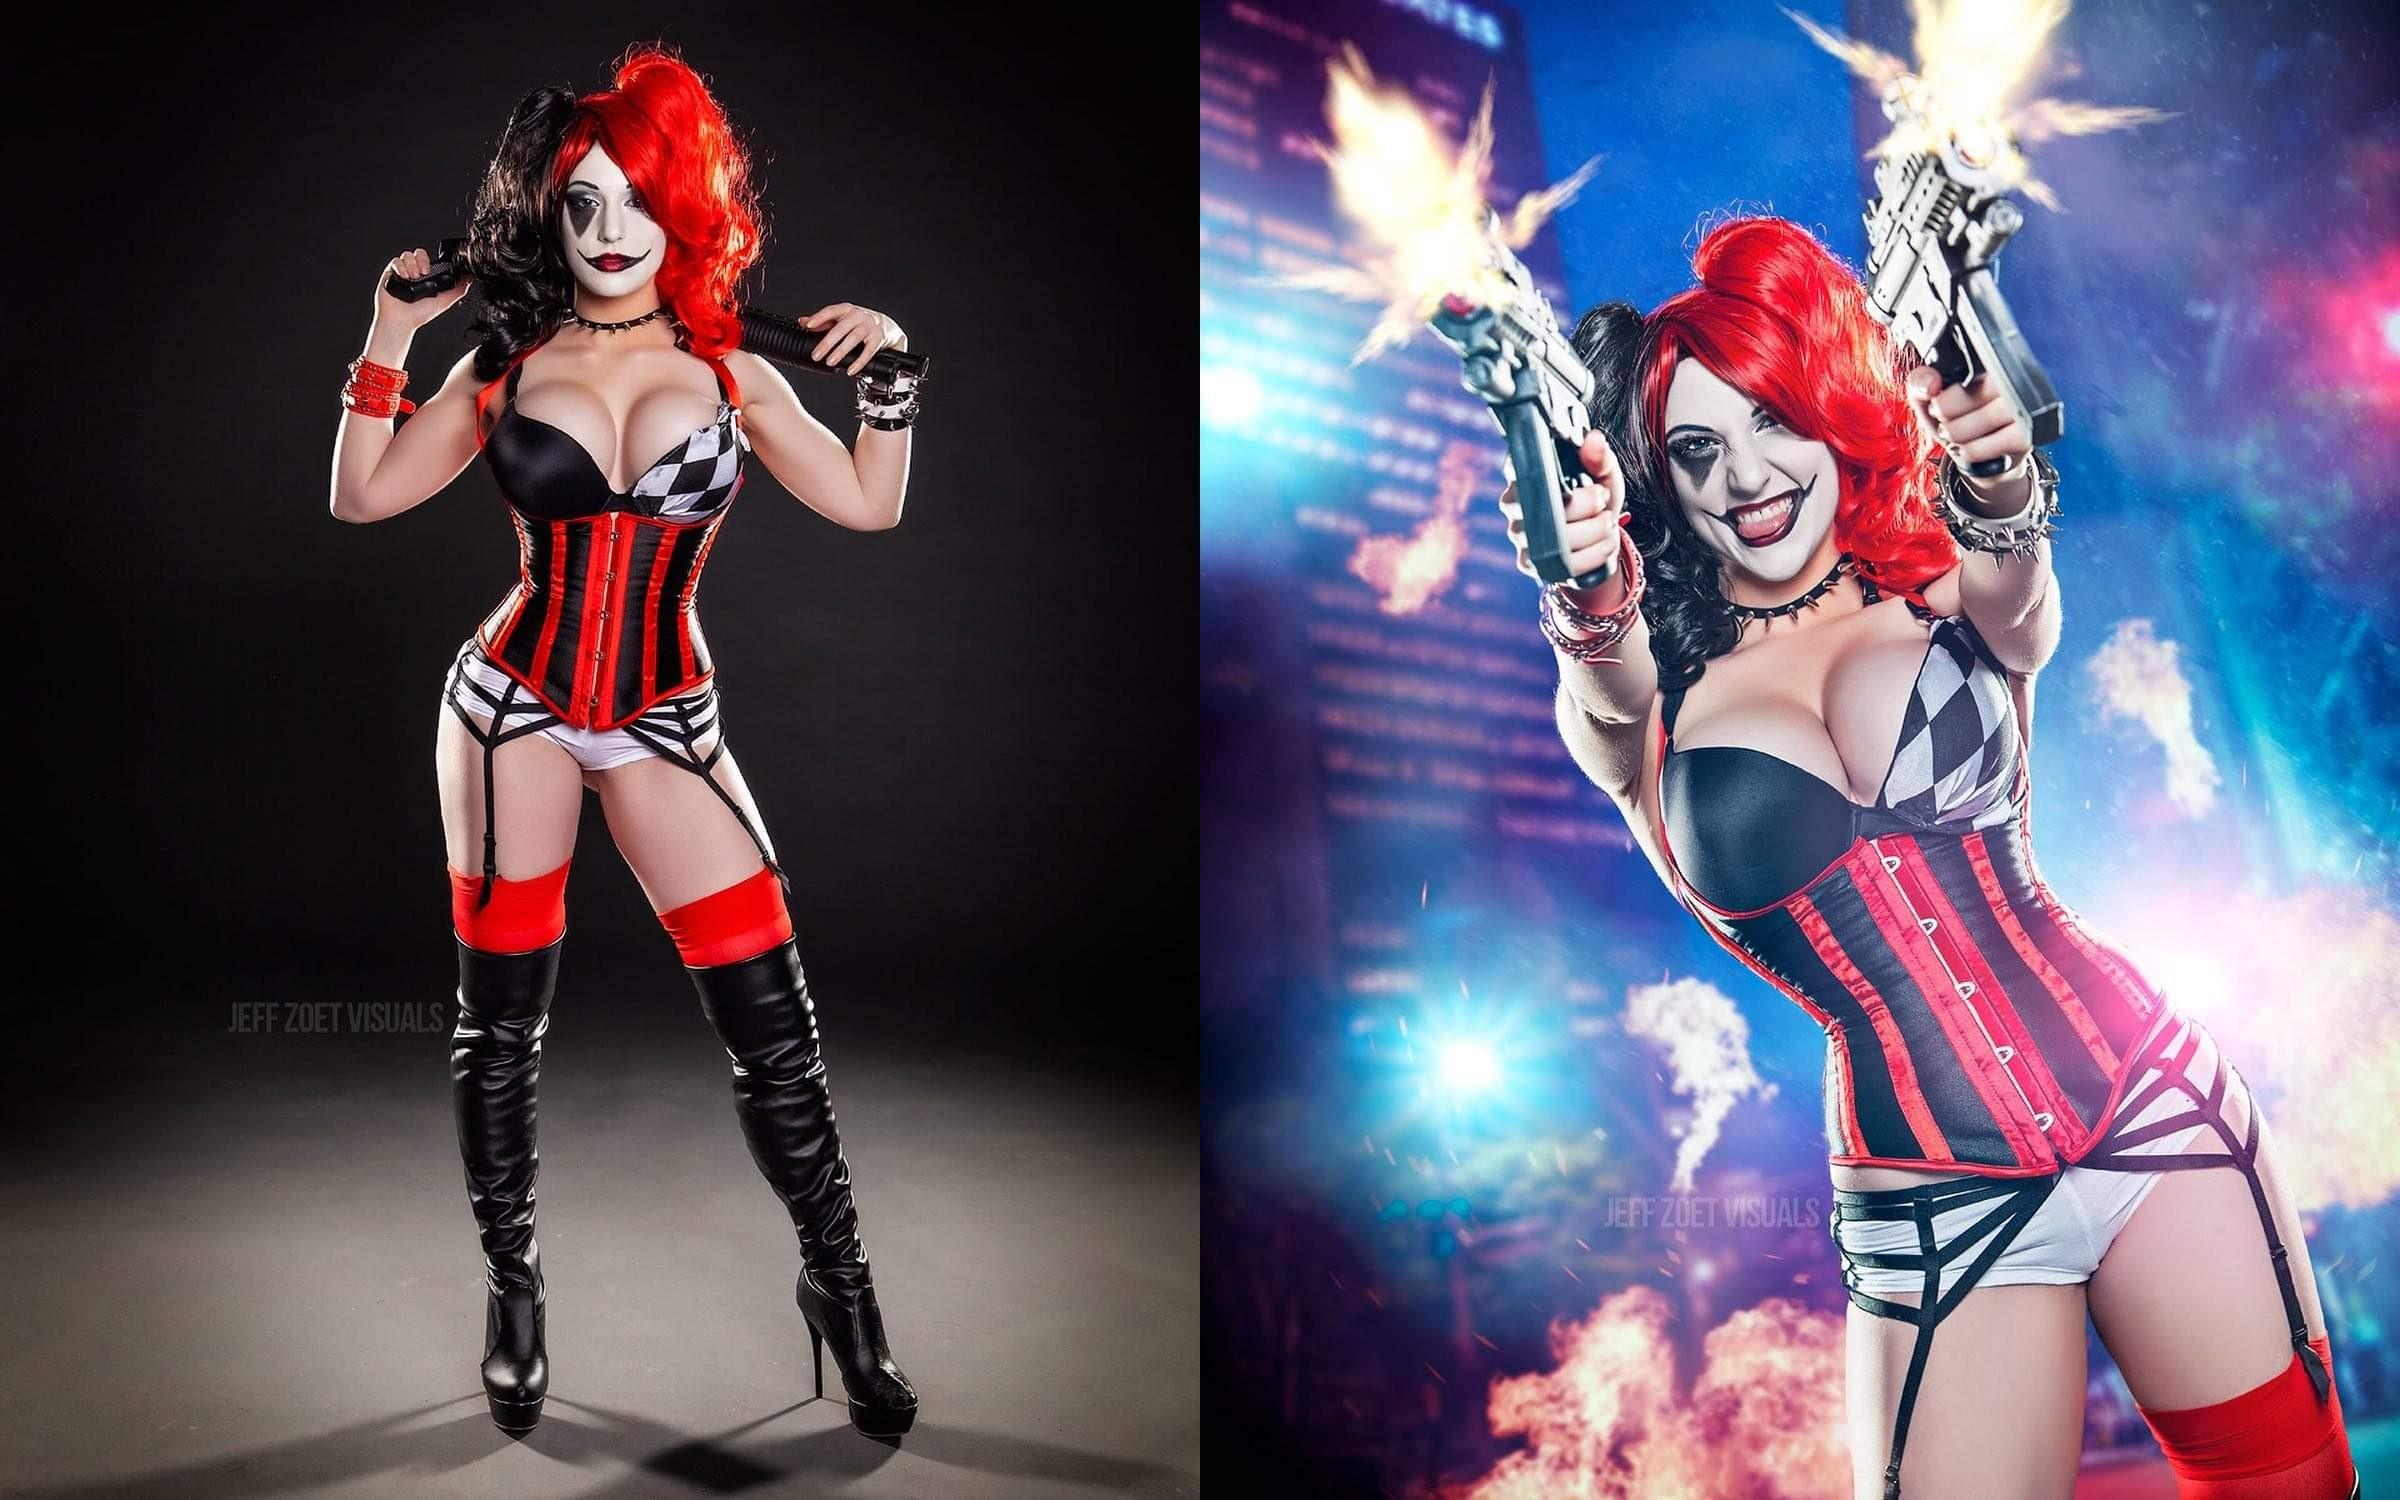 Harley Quinn By @Claireana